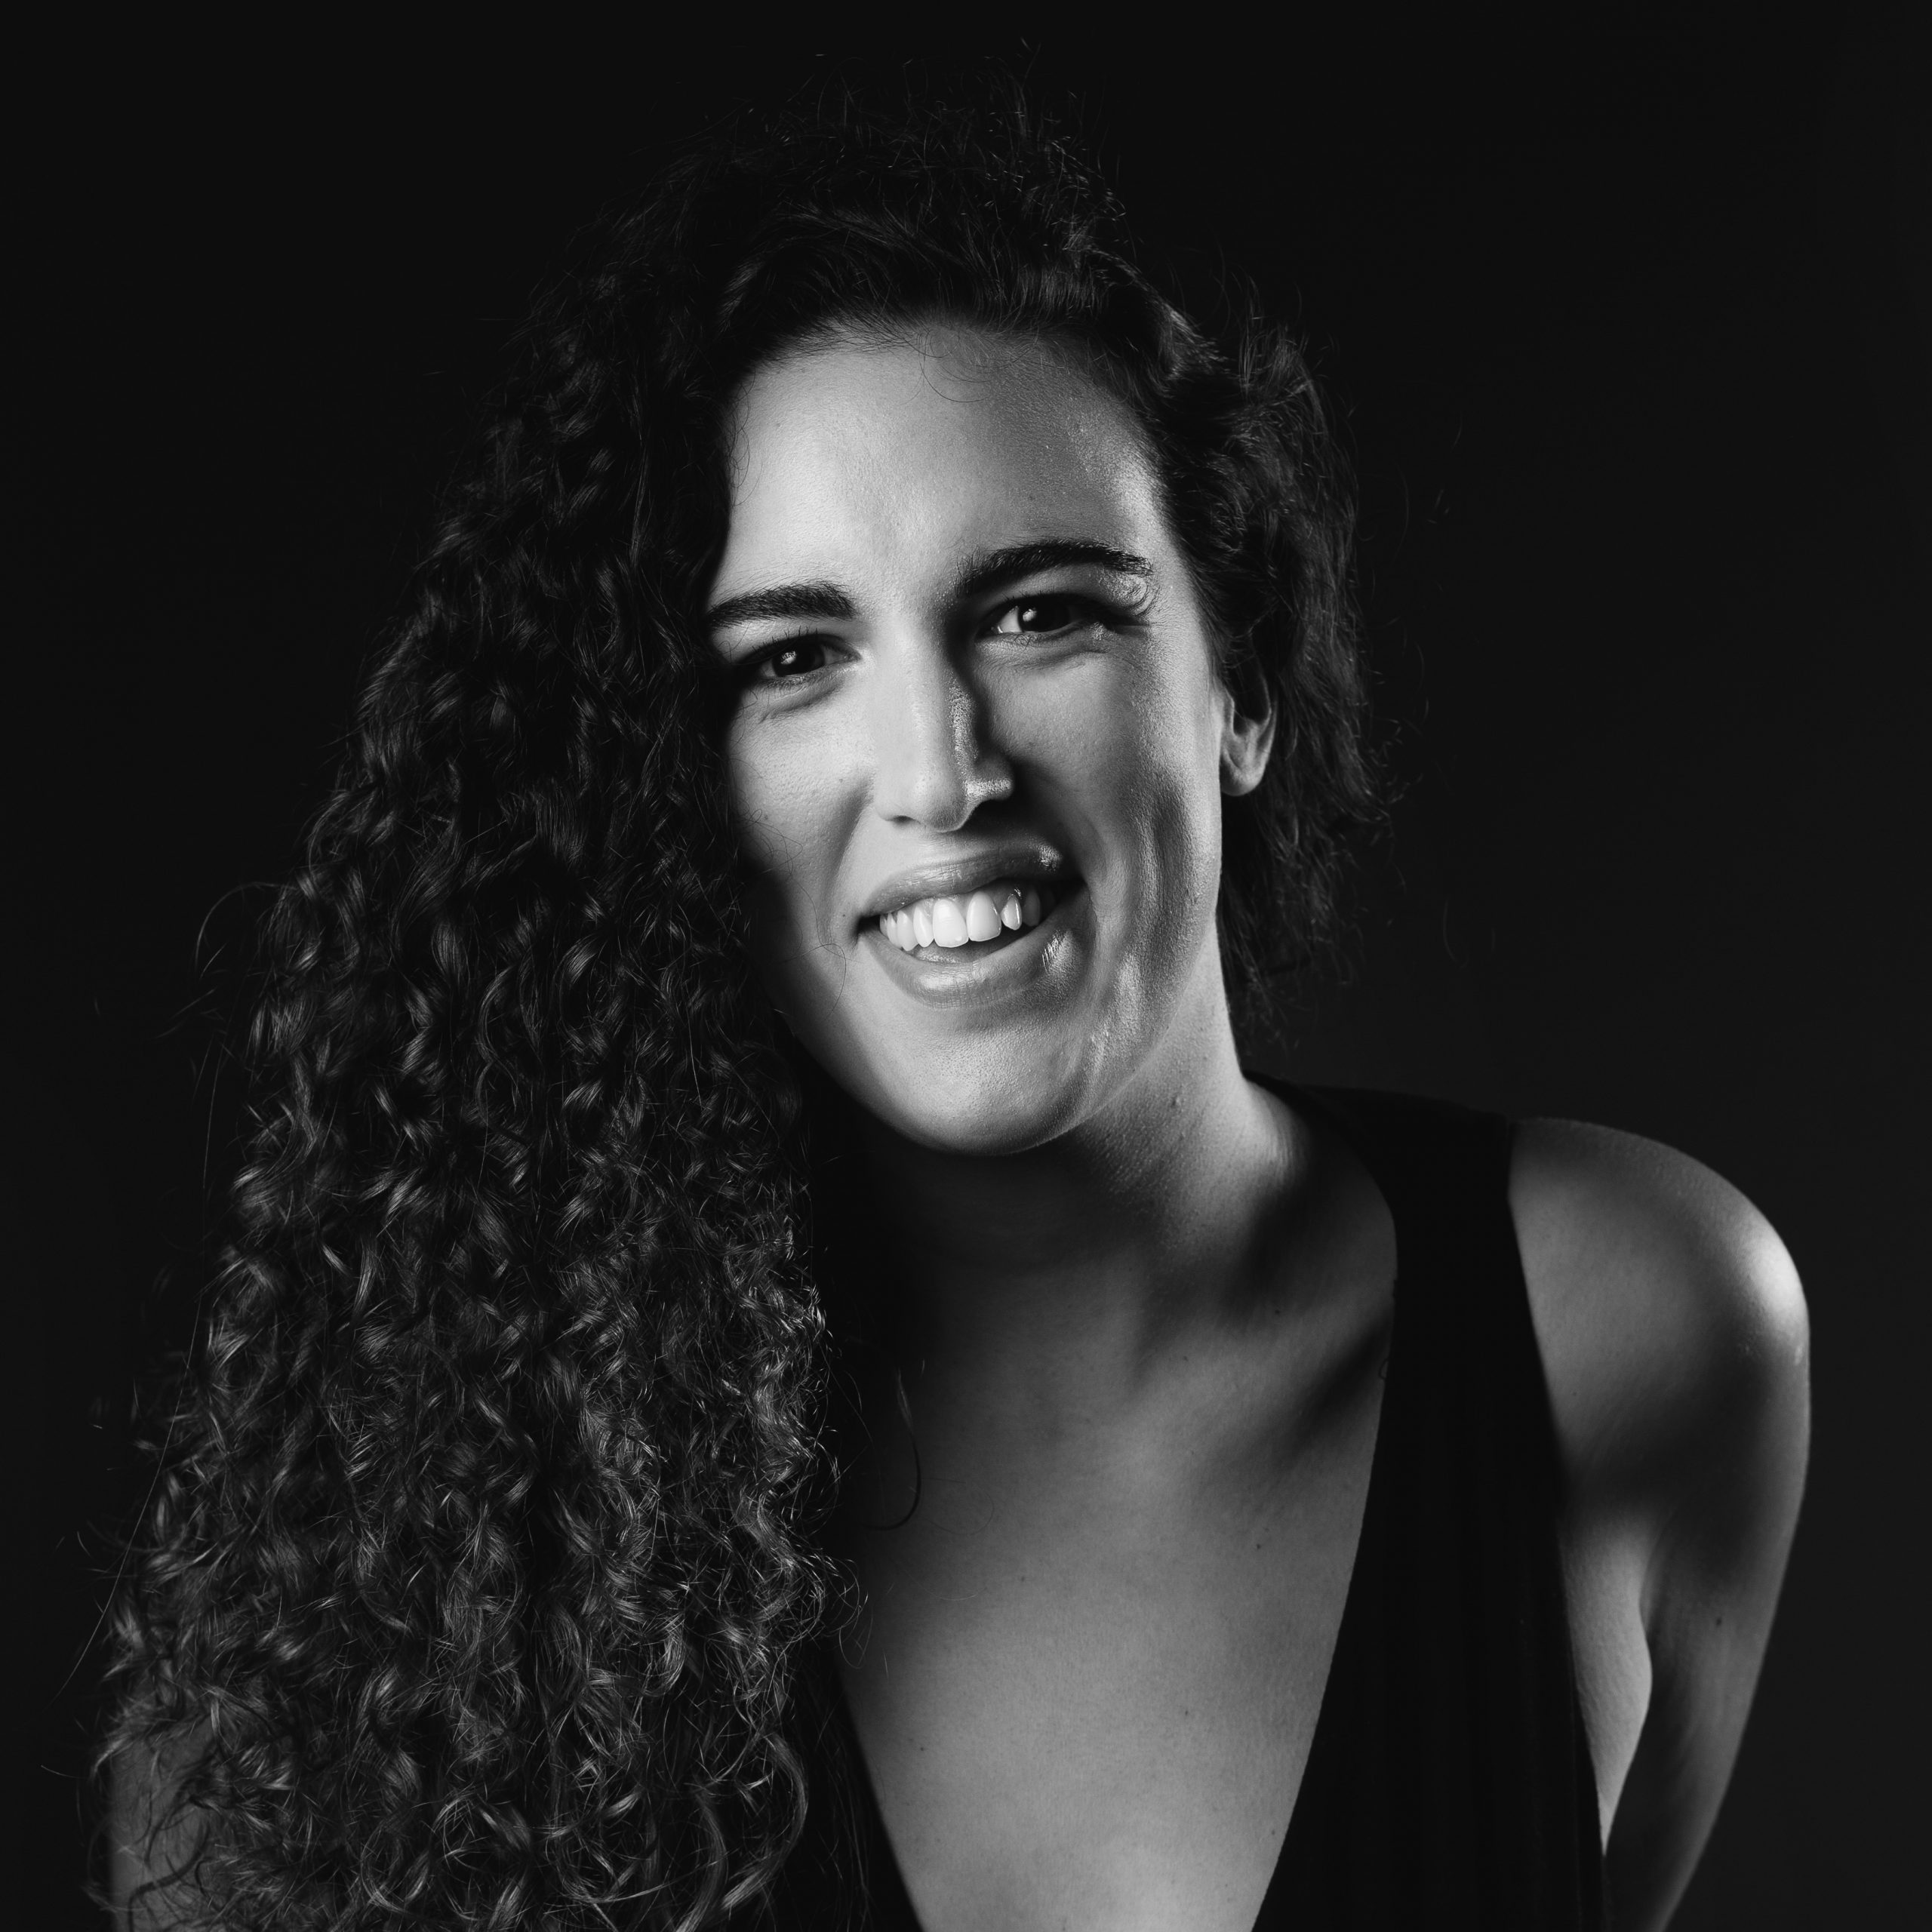 Núria Llausí